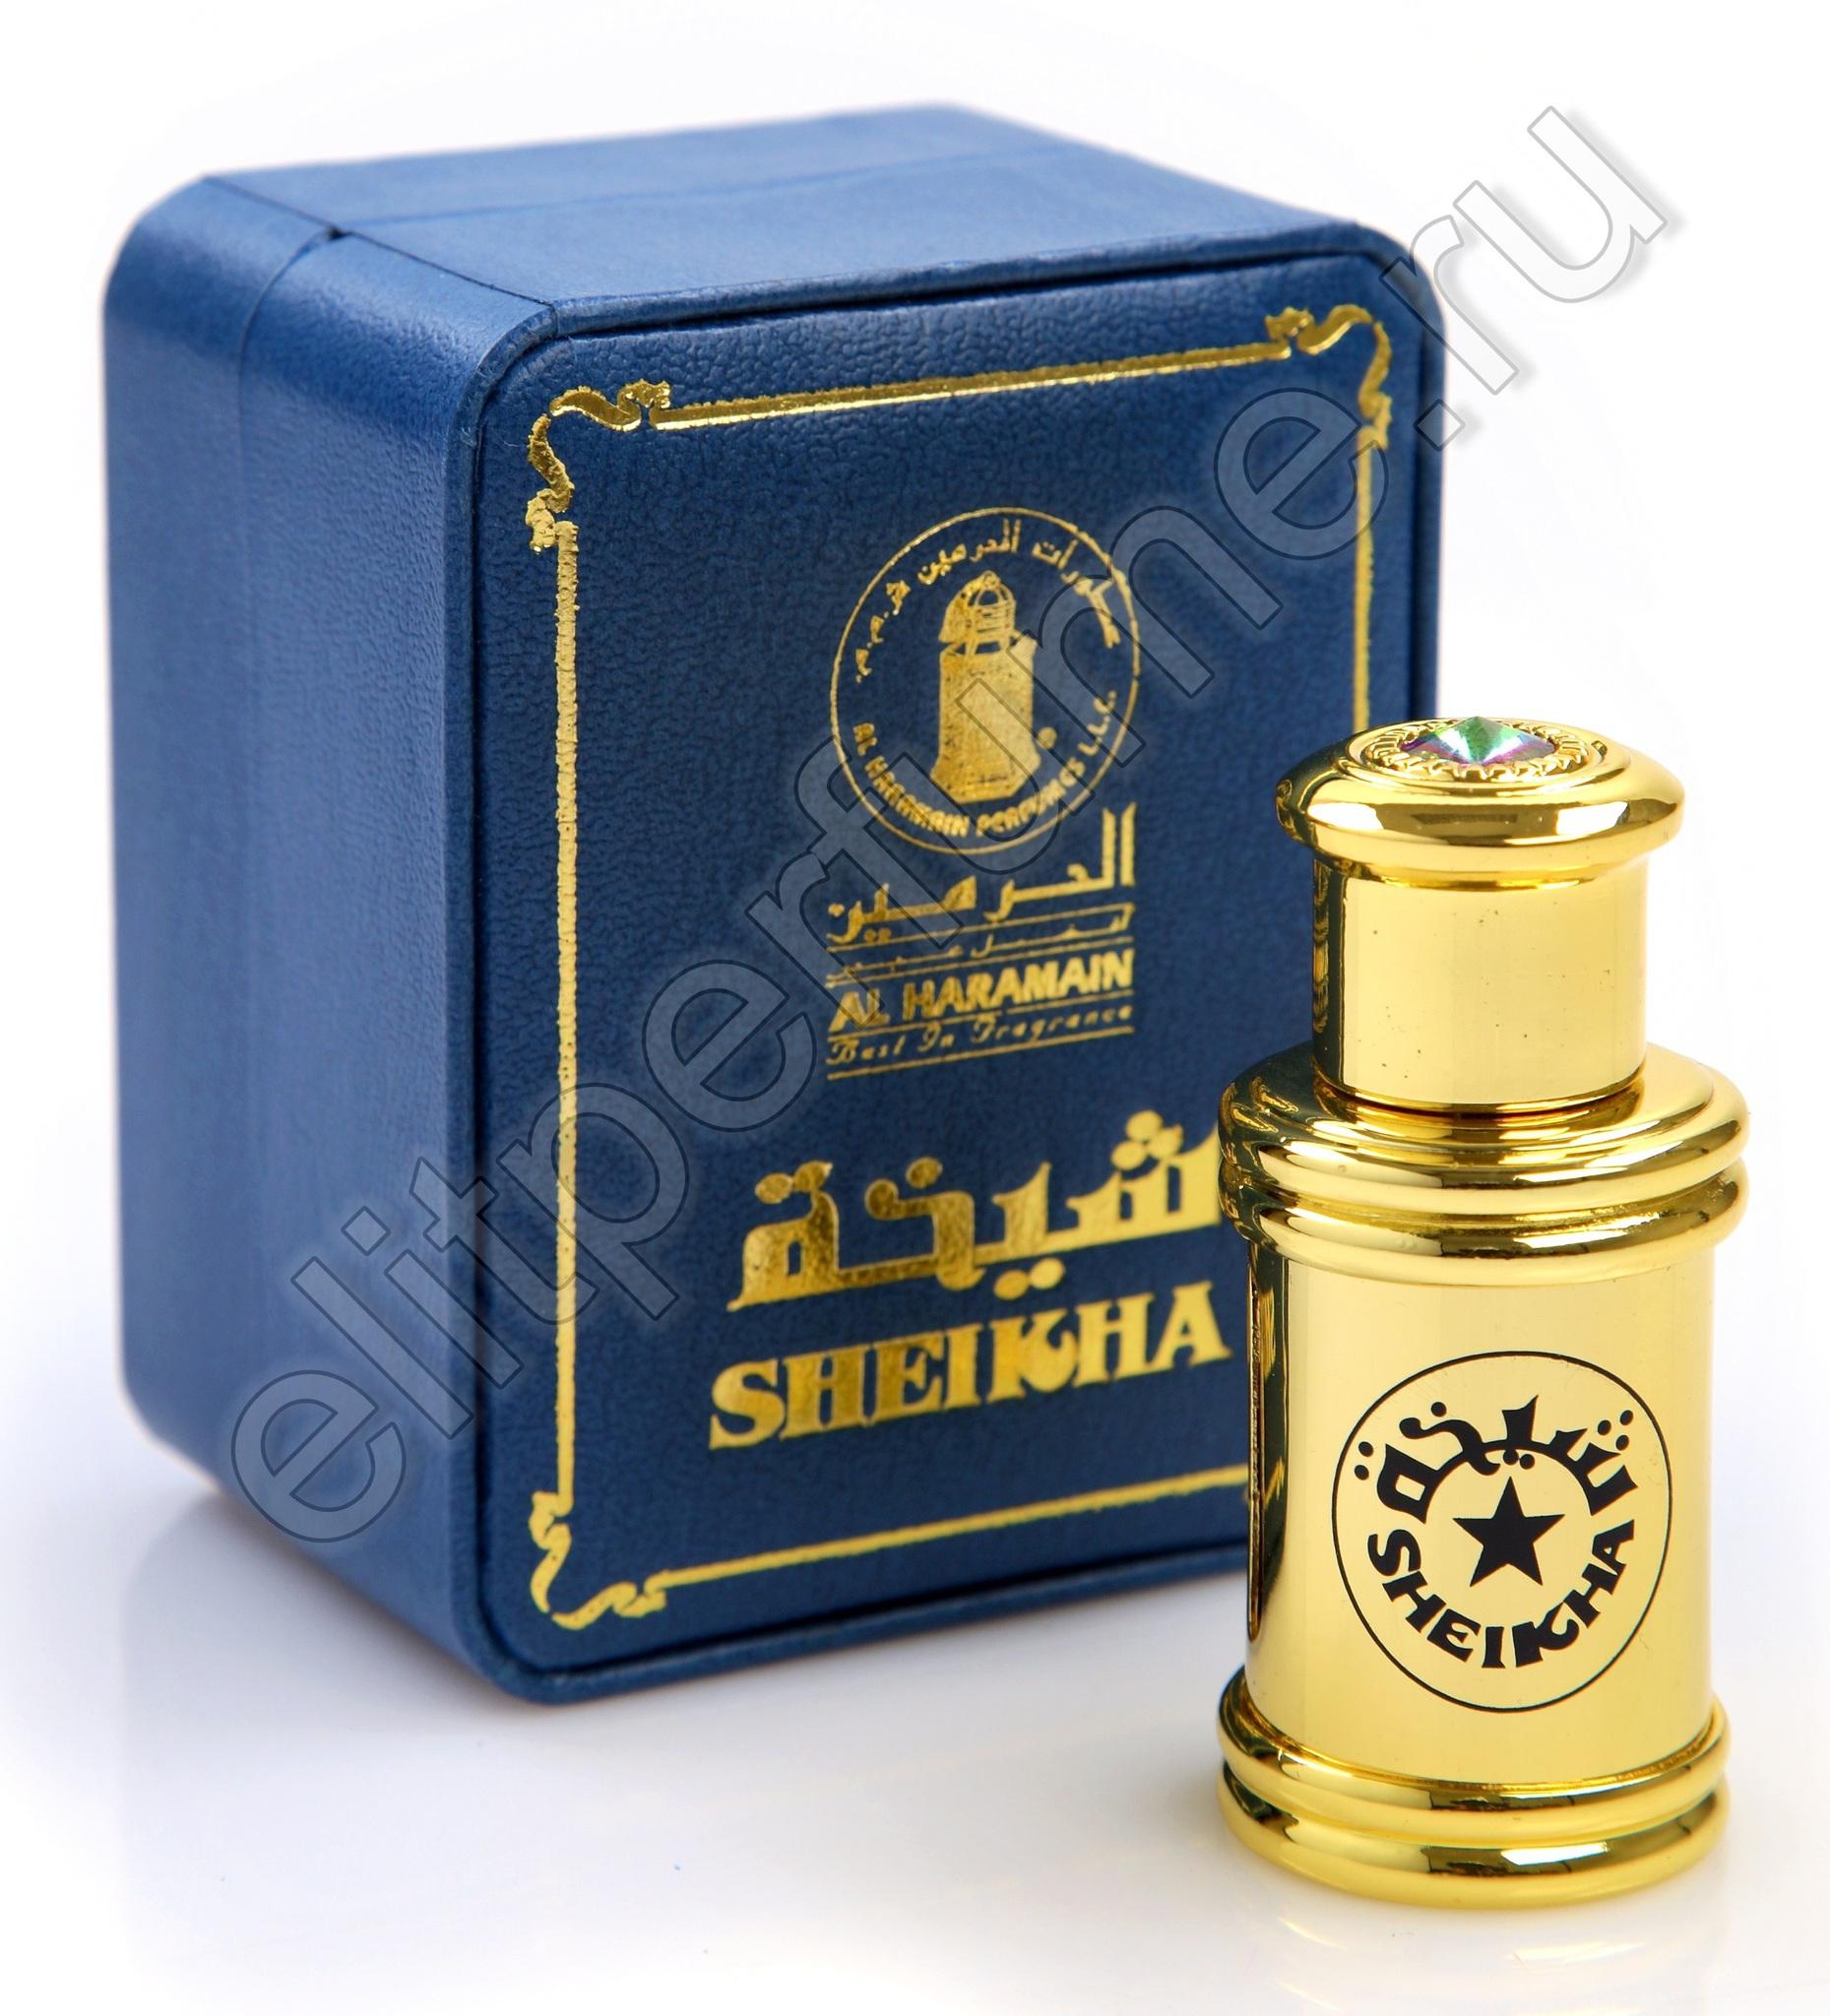 Арабские духи Шейха Sheikha